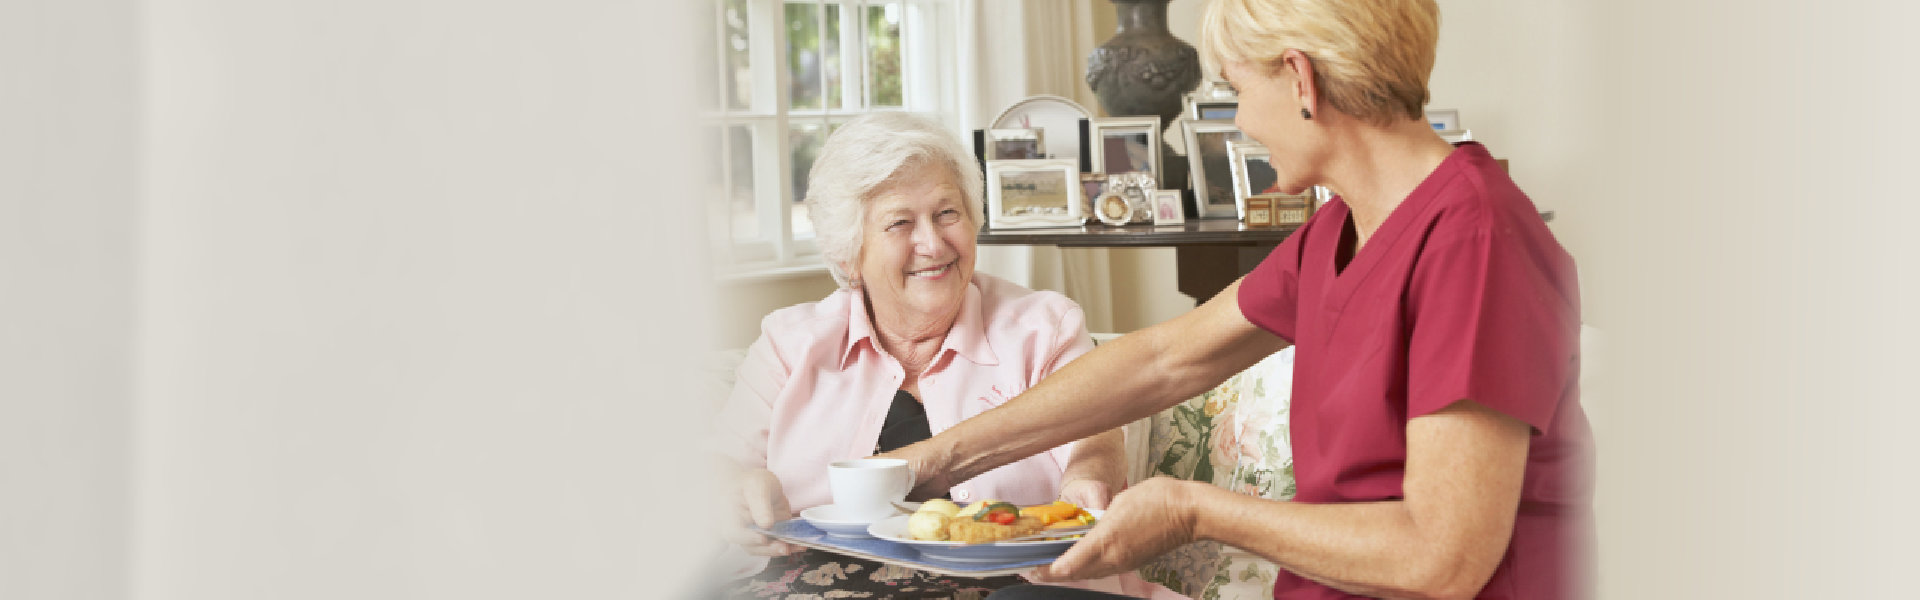 caregiver serving food to senior woman